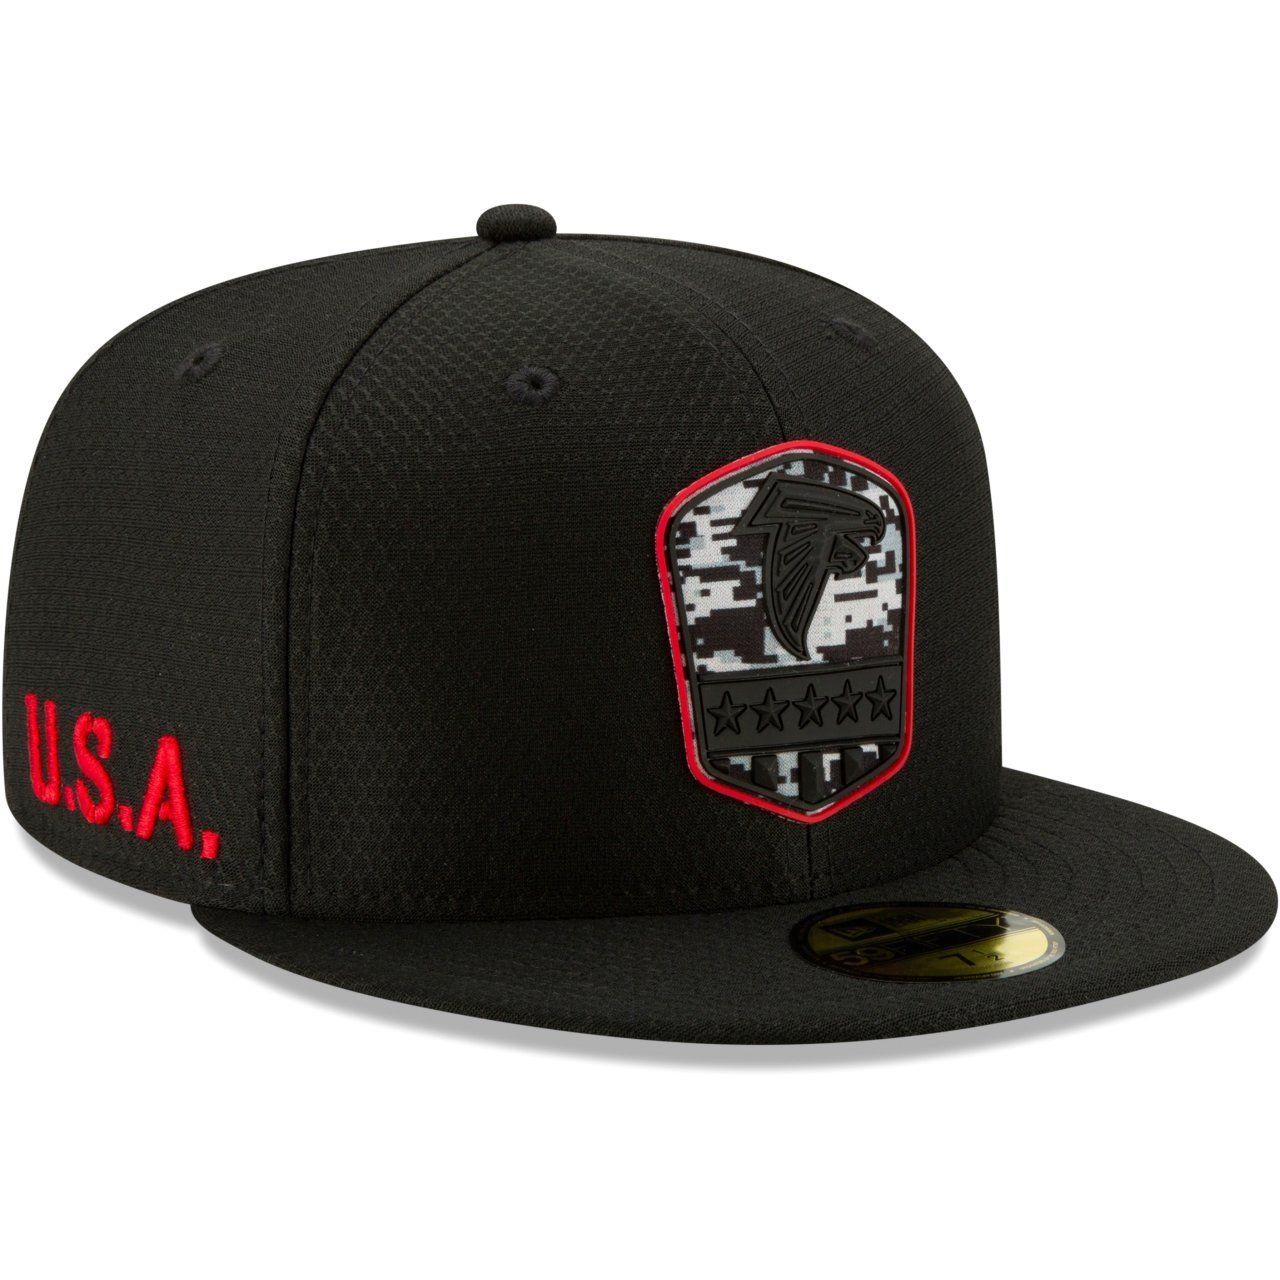 amfoo - New Era 59Fifty Cap - Salute to Service Atlanta Falcons